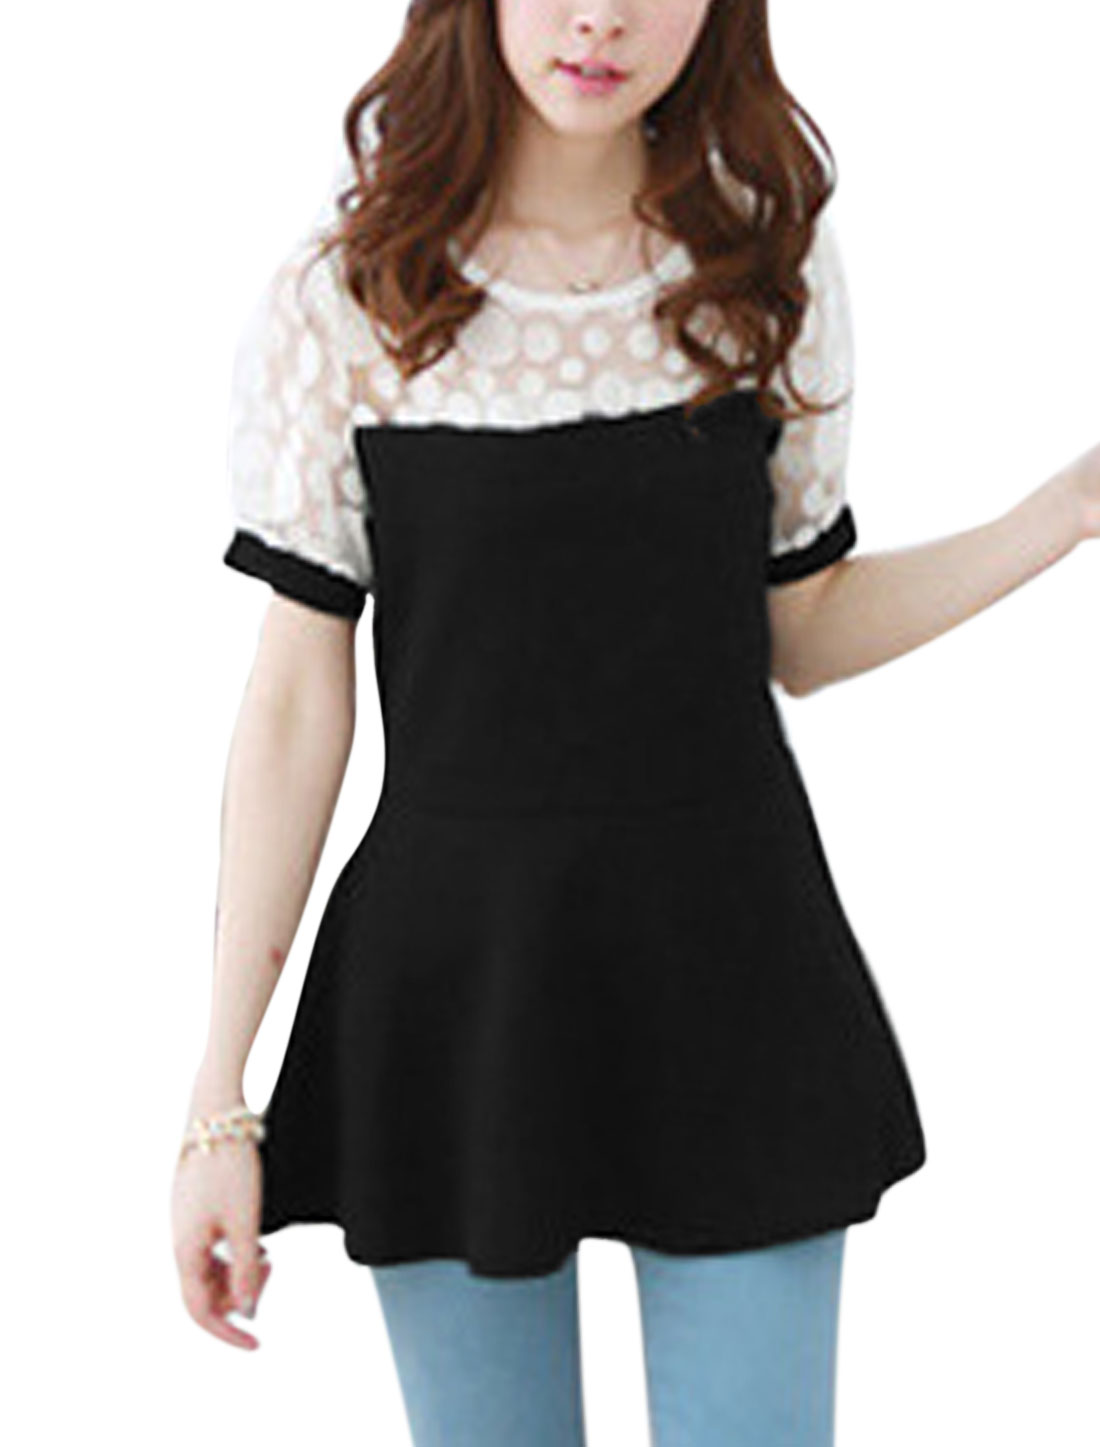 Lady Short Sleeve Dots Prints Mesh Panel Peplum Top Black XS